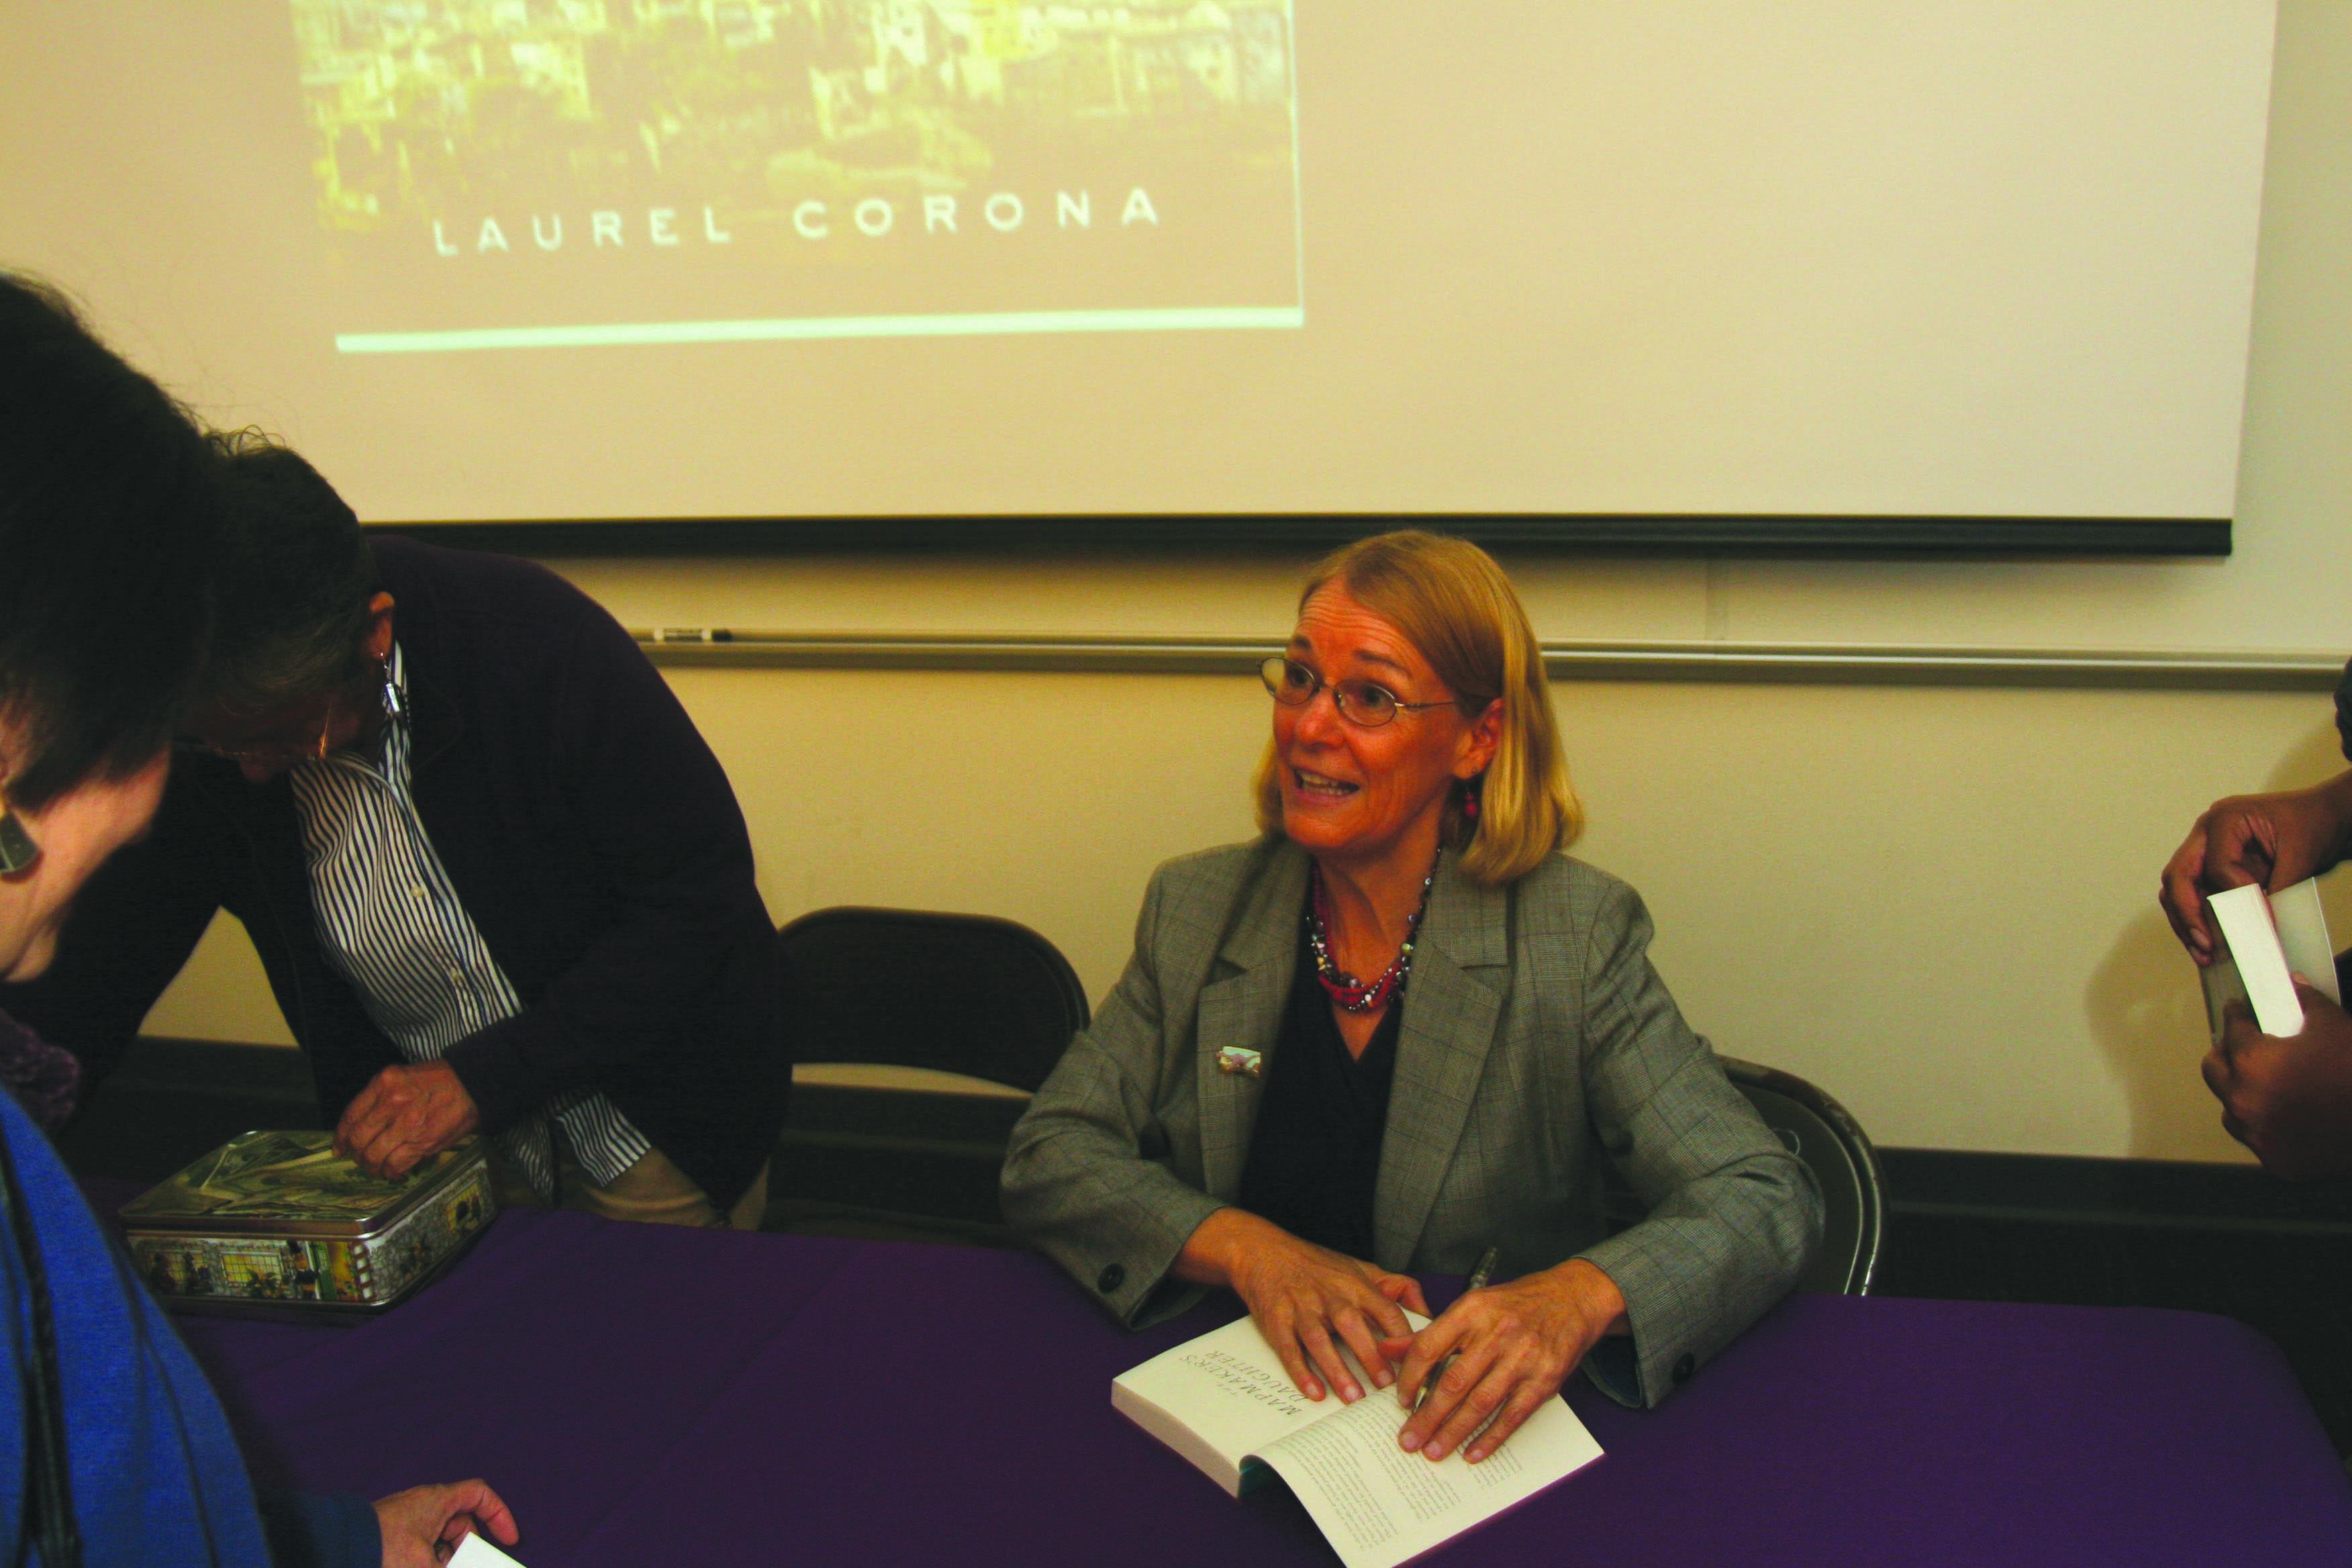 Humanities professor Laurel Corona with a copy of her latest book